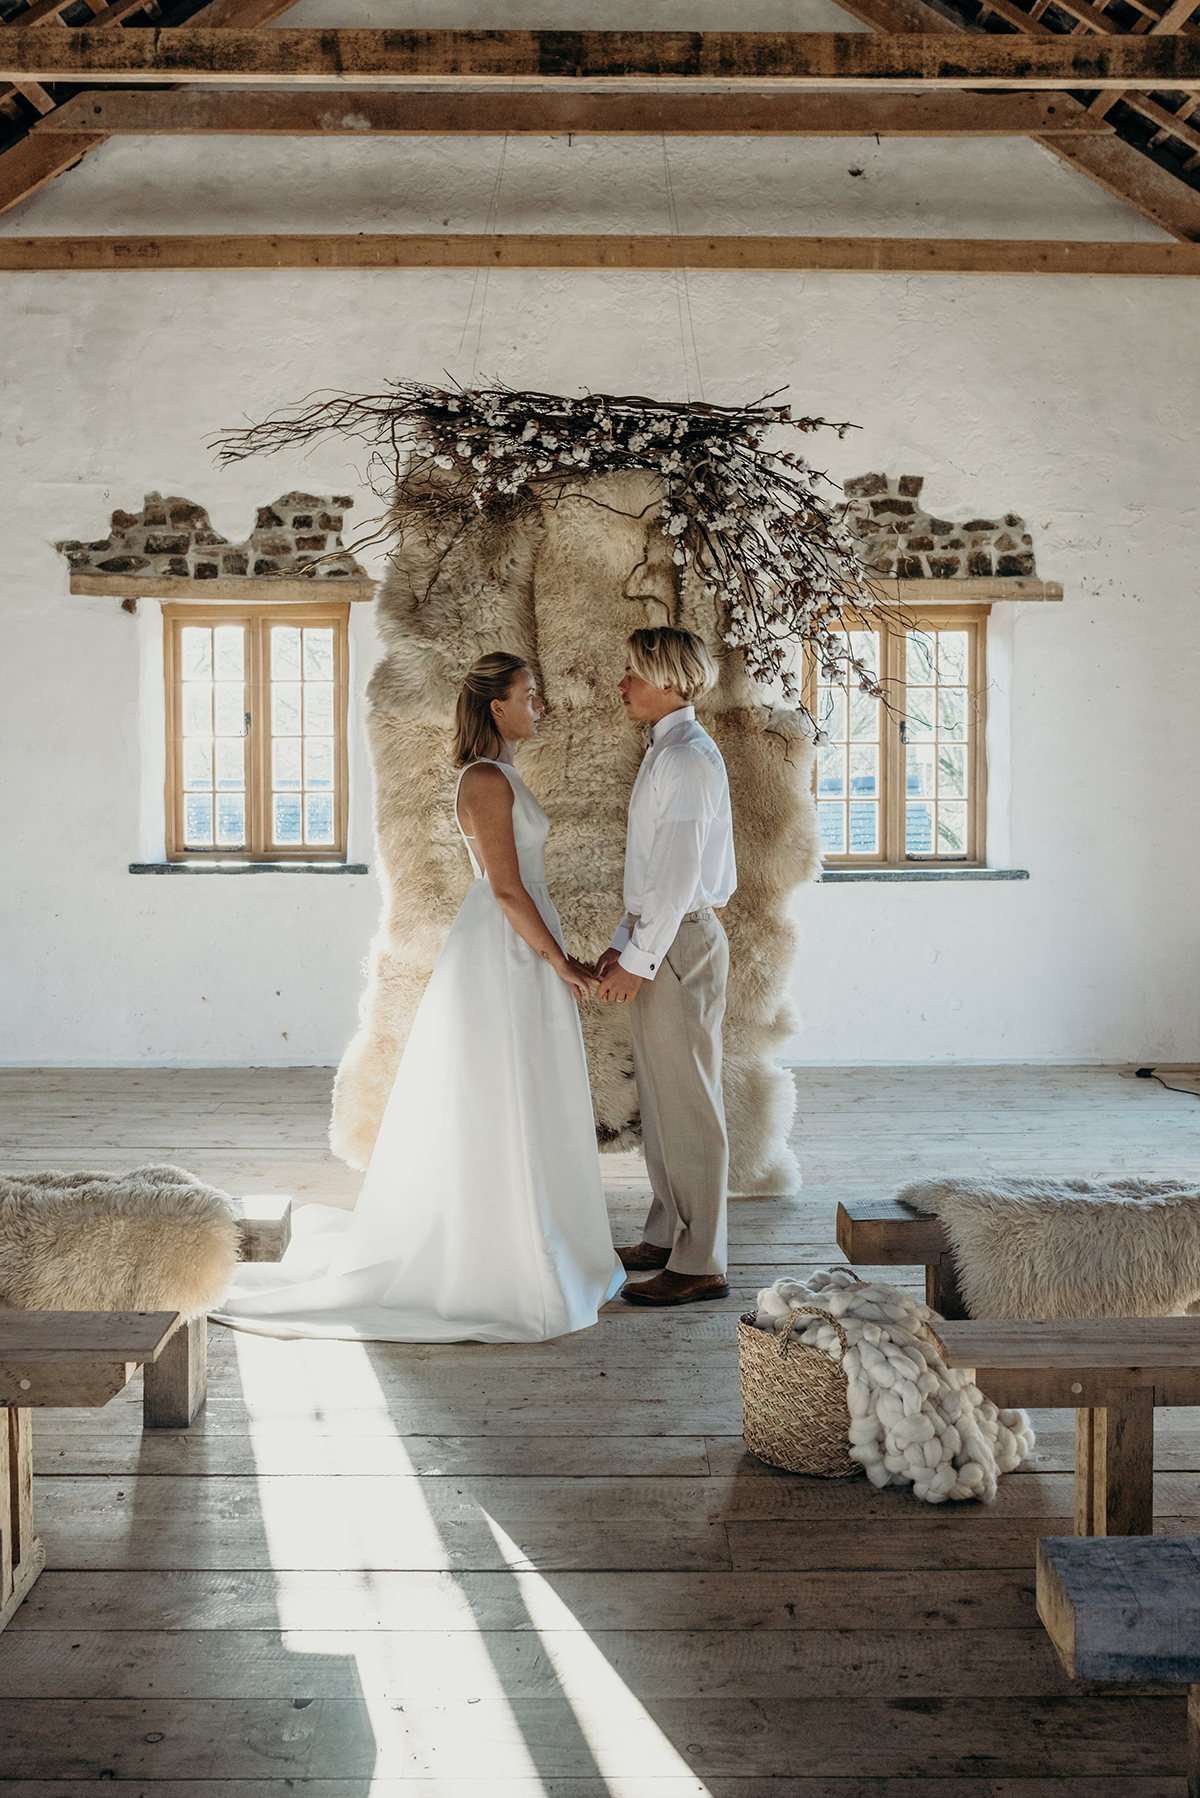 sheepskin ceremony backdrop